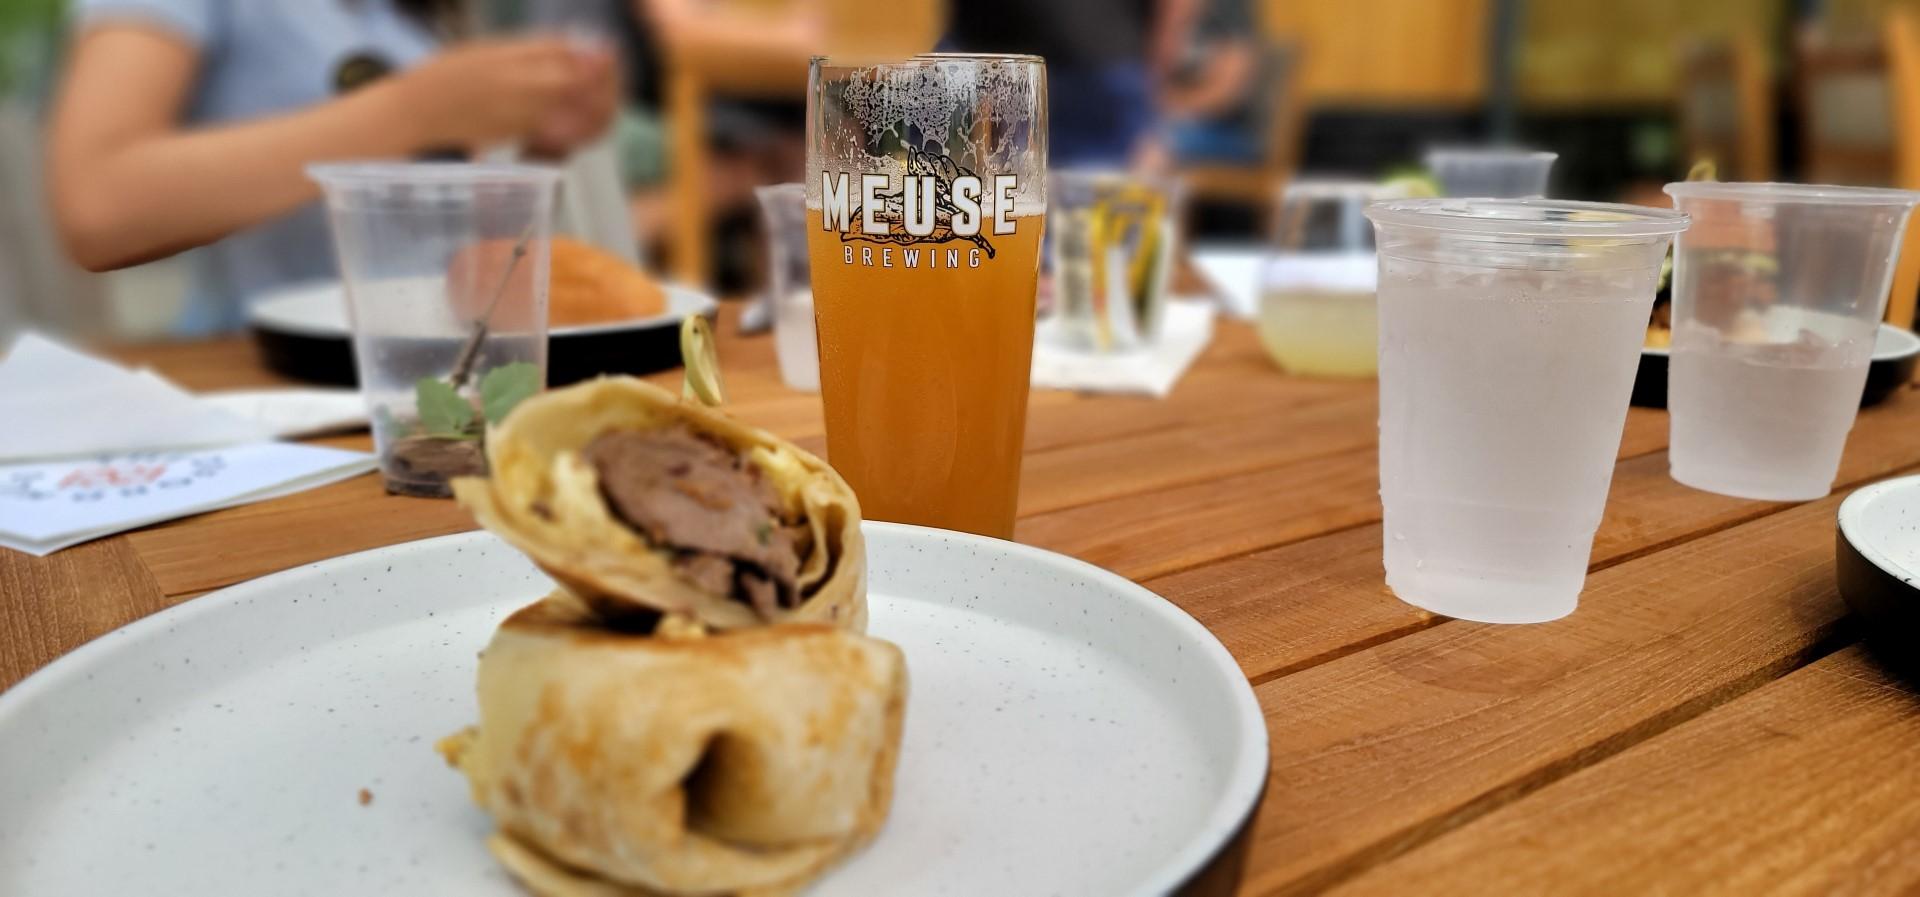 beer and breakfast burrito